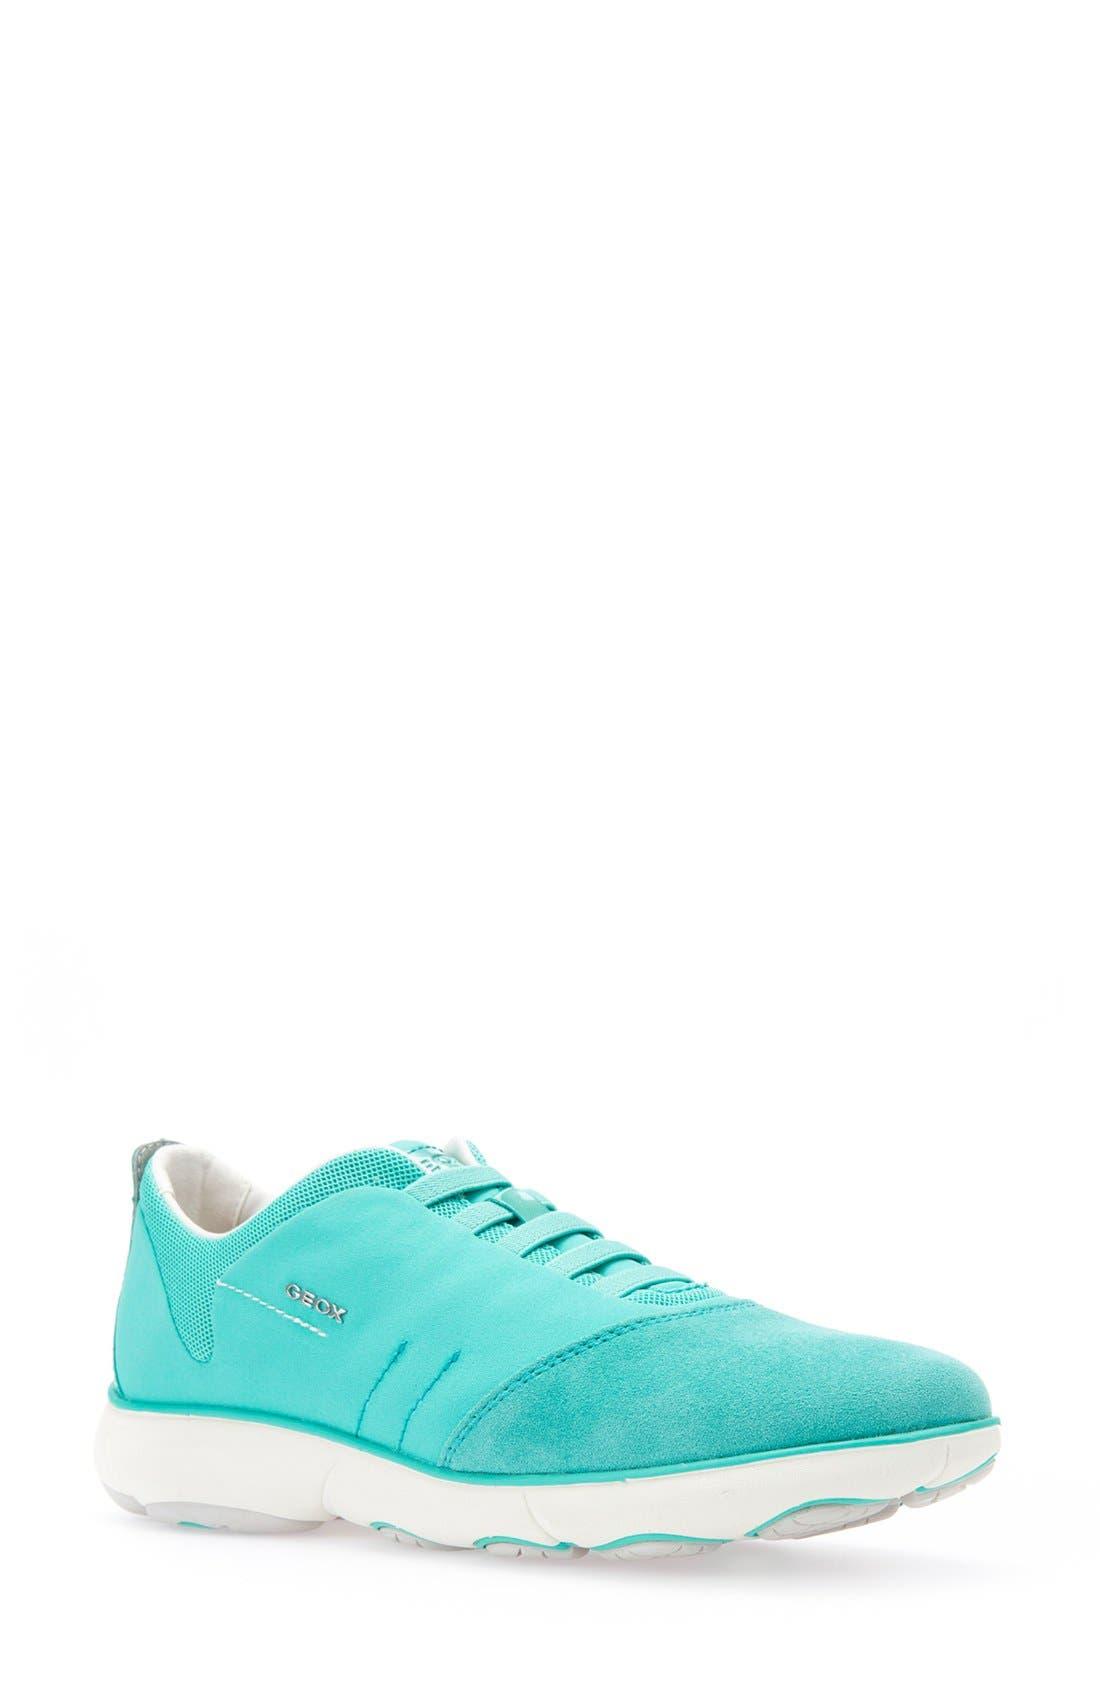 Nebula Sneaker,                         Main,                         color, Sea Water Blue